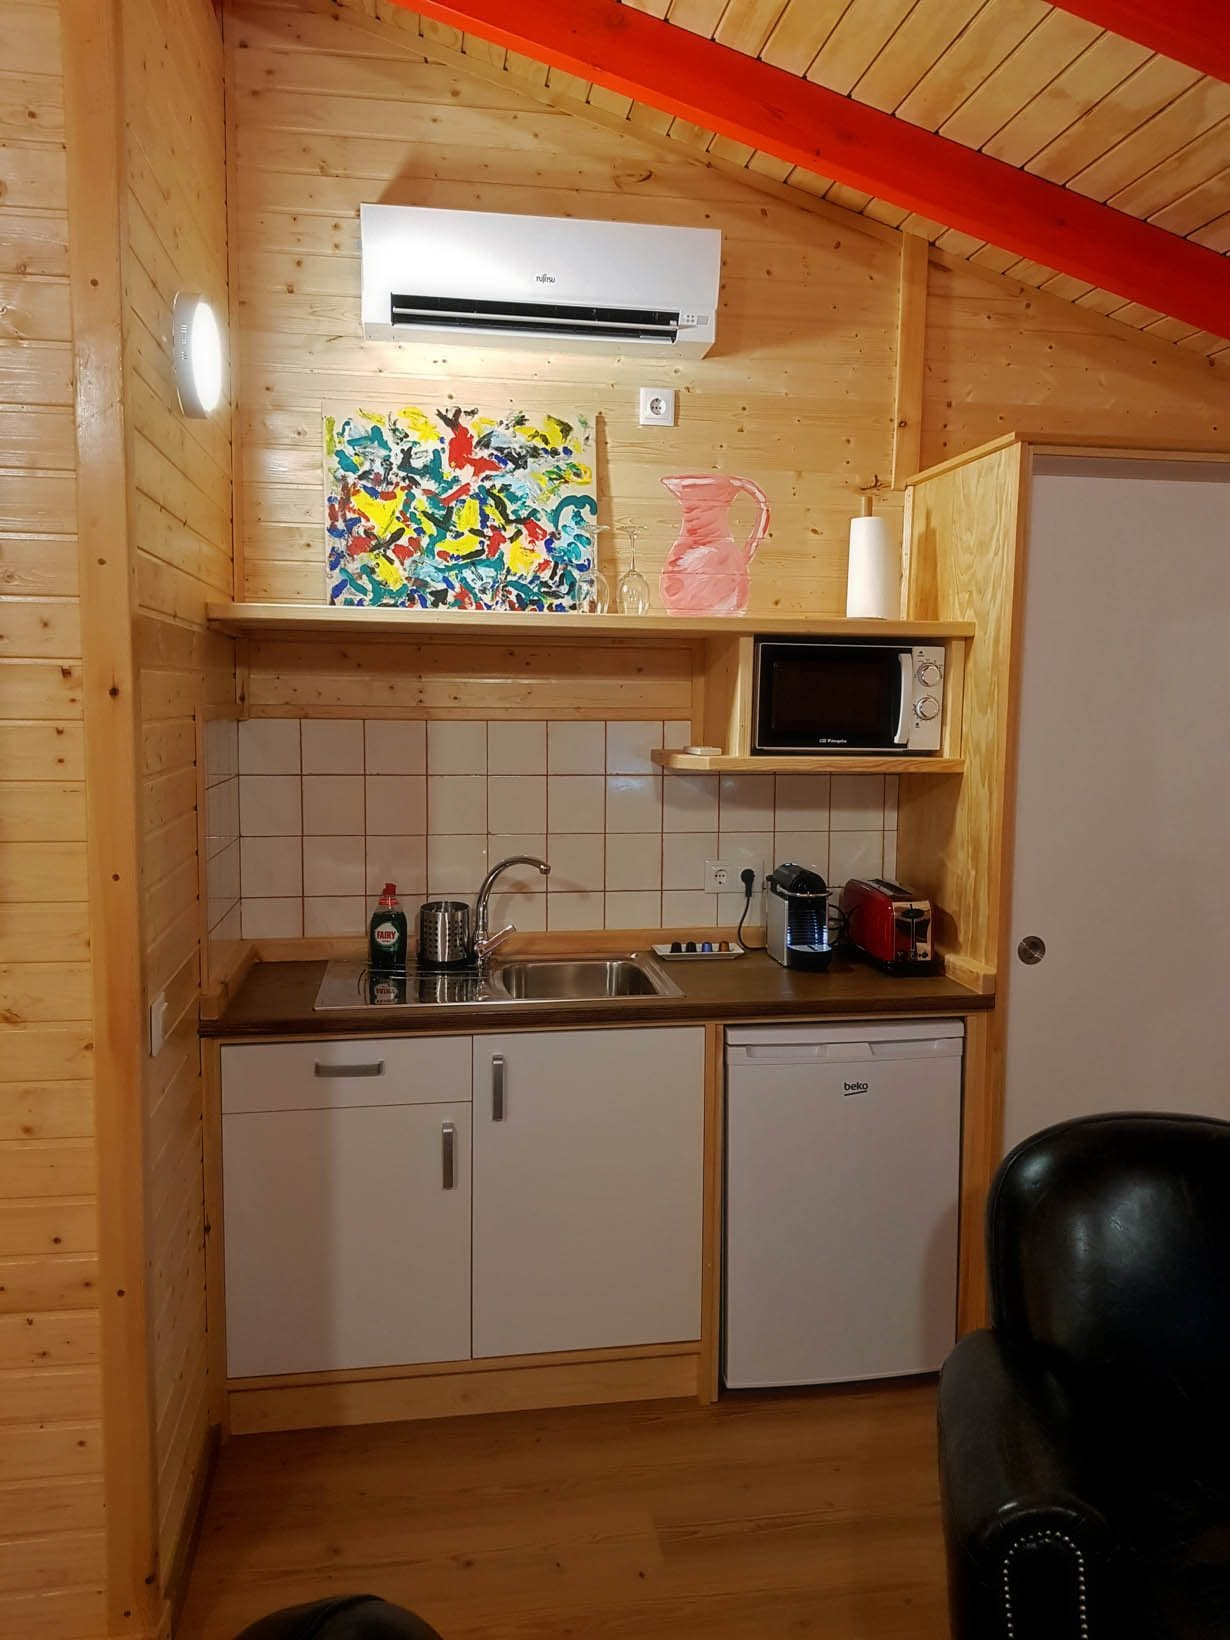 Alojamiento-Casa-del-gato-05